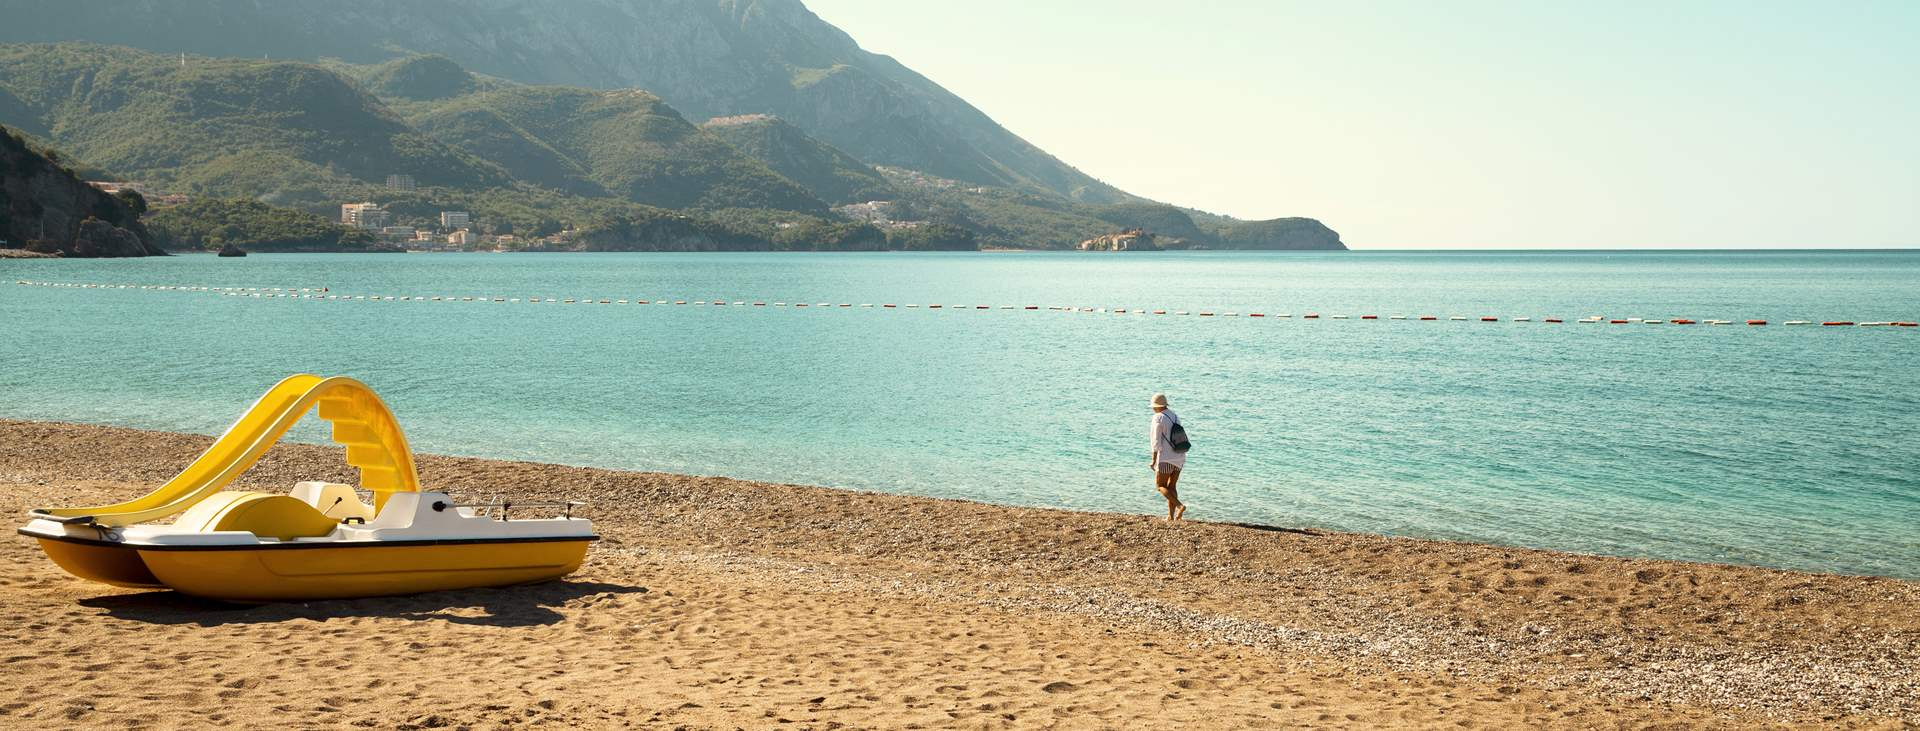 Bestill en reise med All Inclusive til Becici i Montenegro